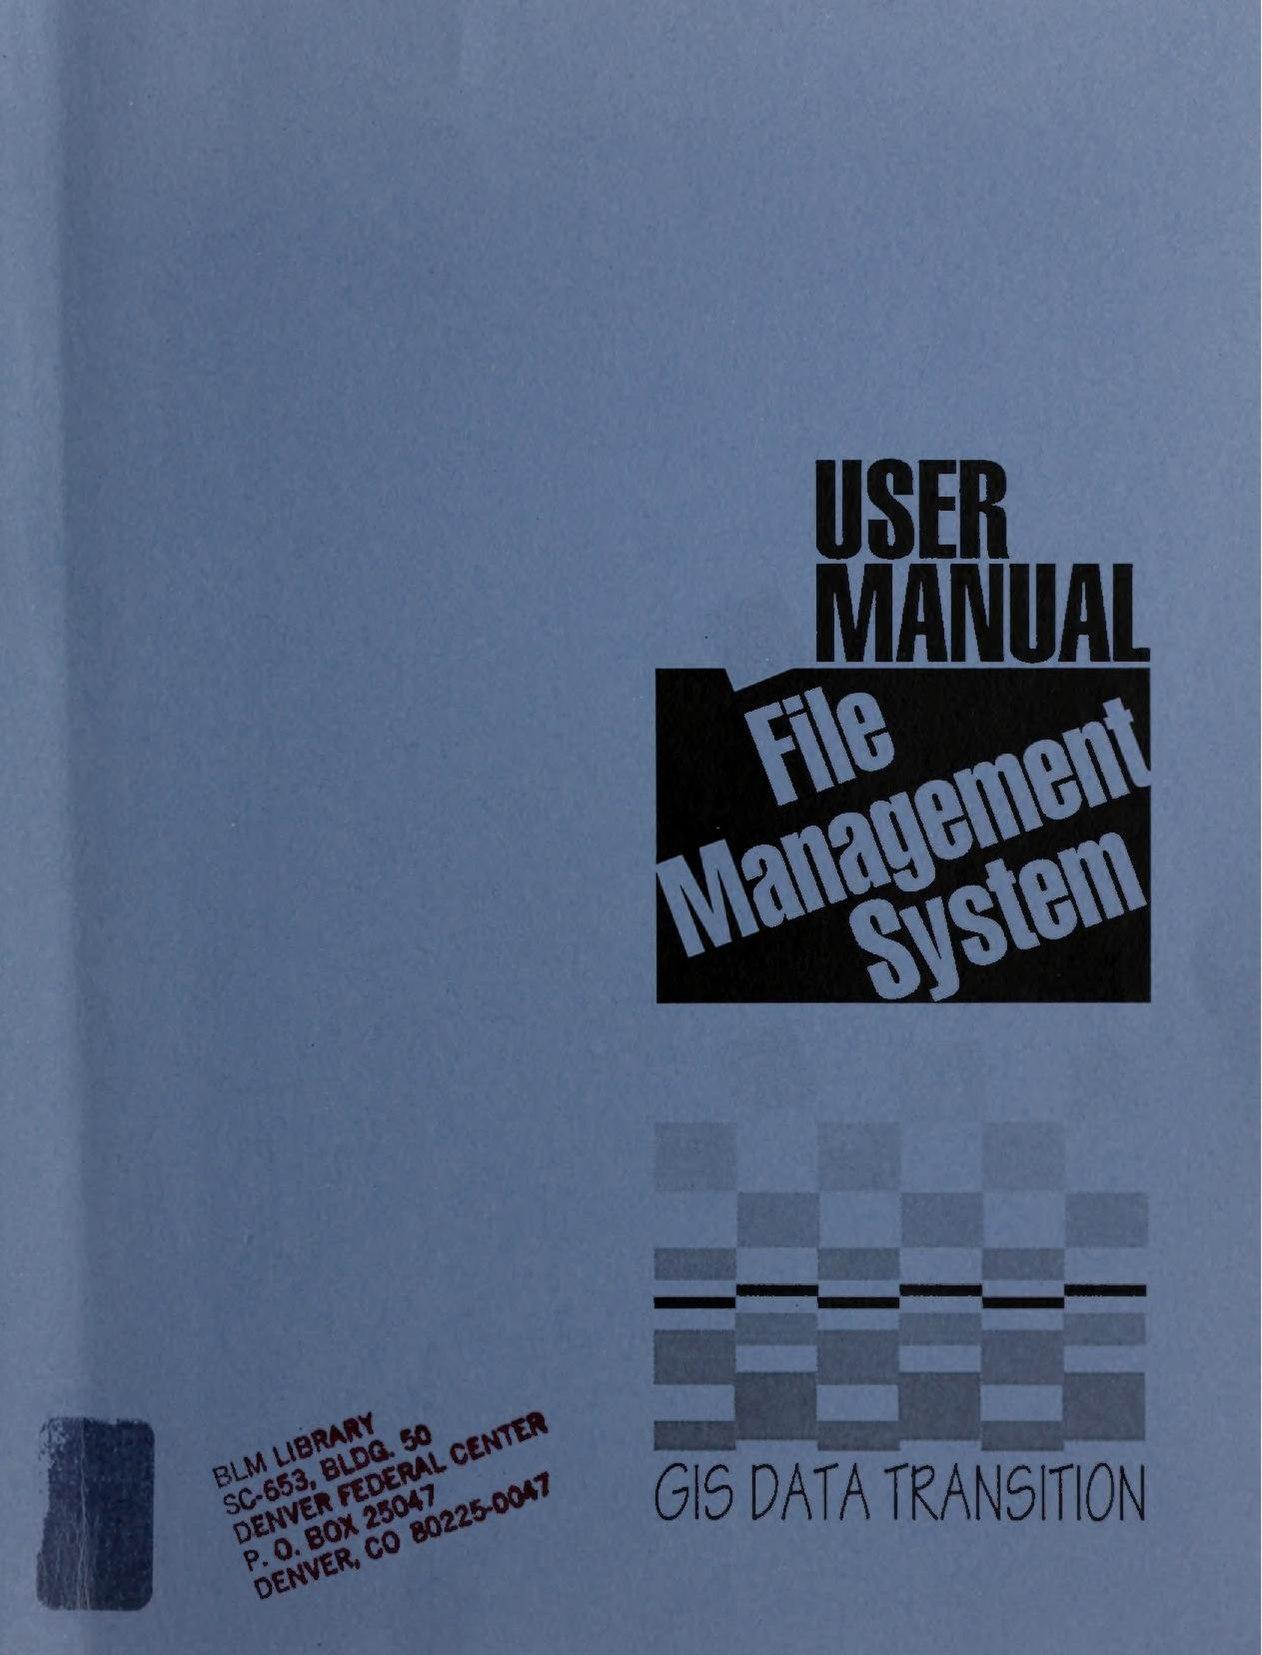 File:File Management System - user manual - GIS data transition ...